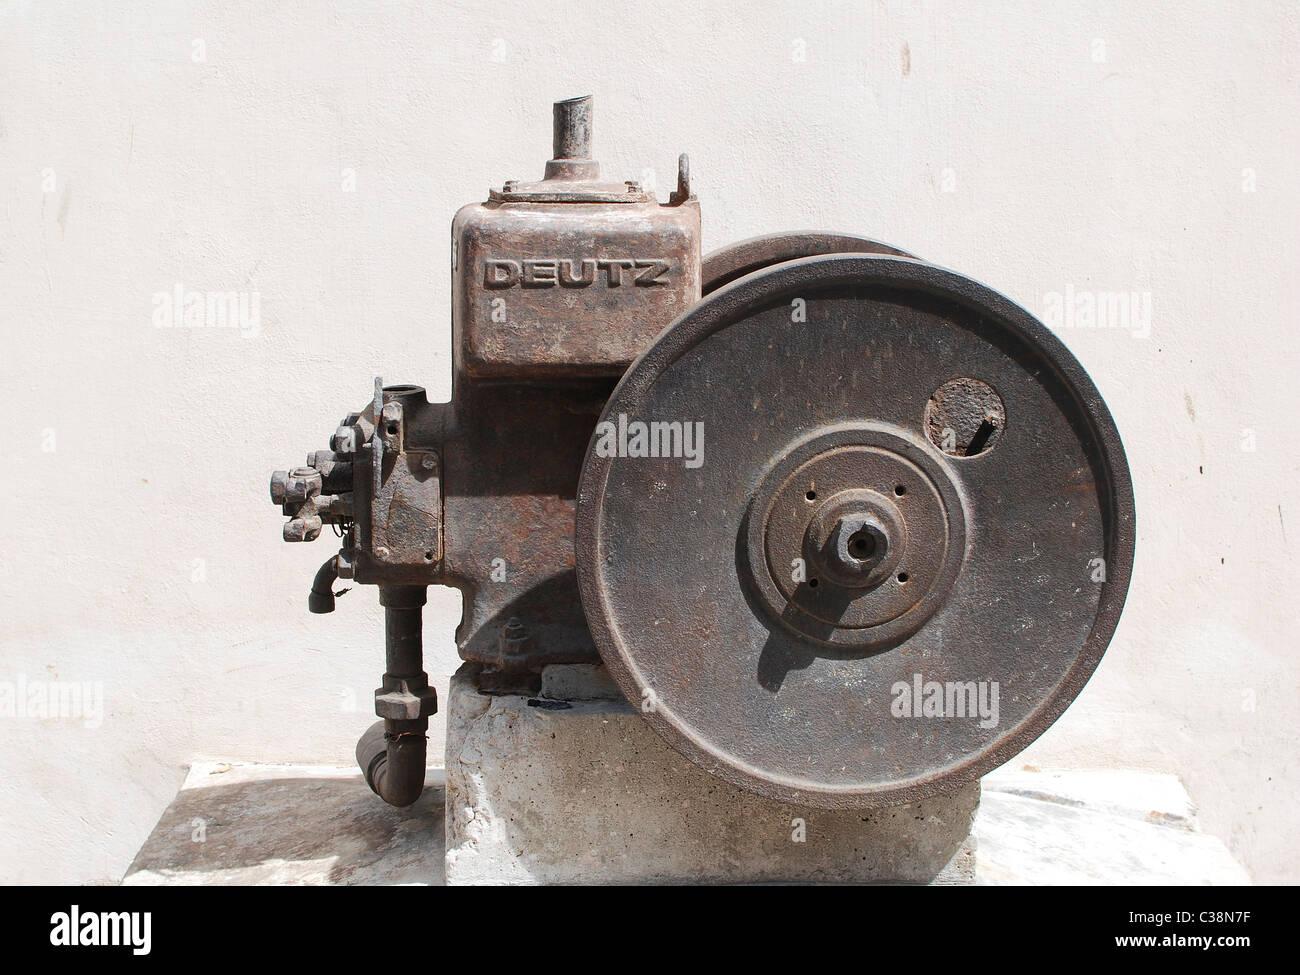 Industrial kerosene powered water pump from 1906 photographed in Israel - Stock Image